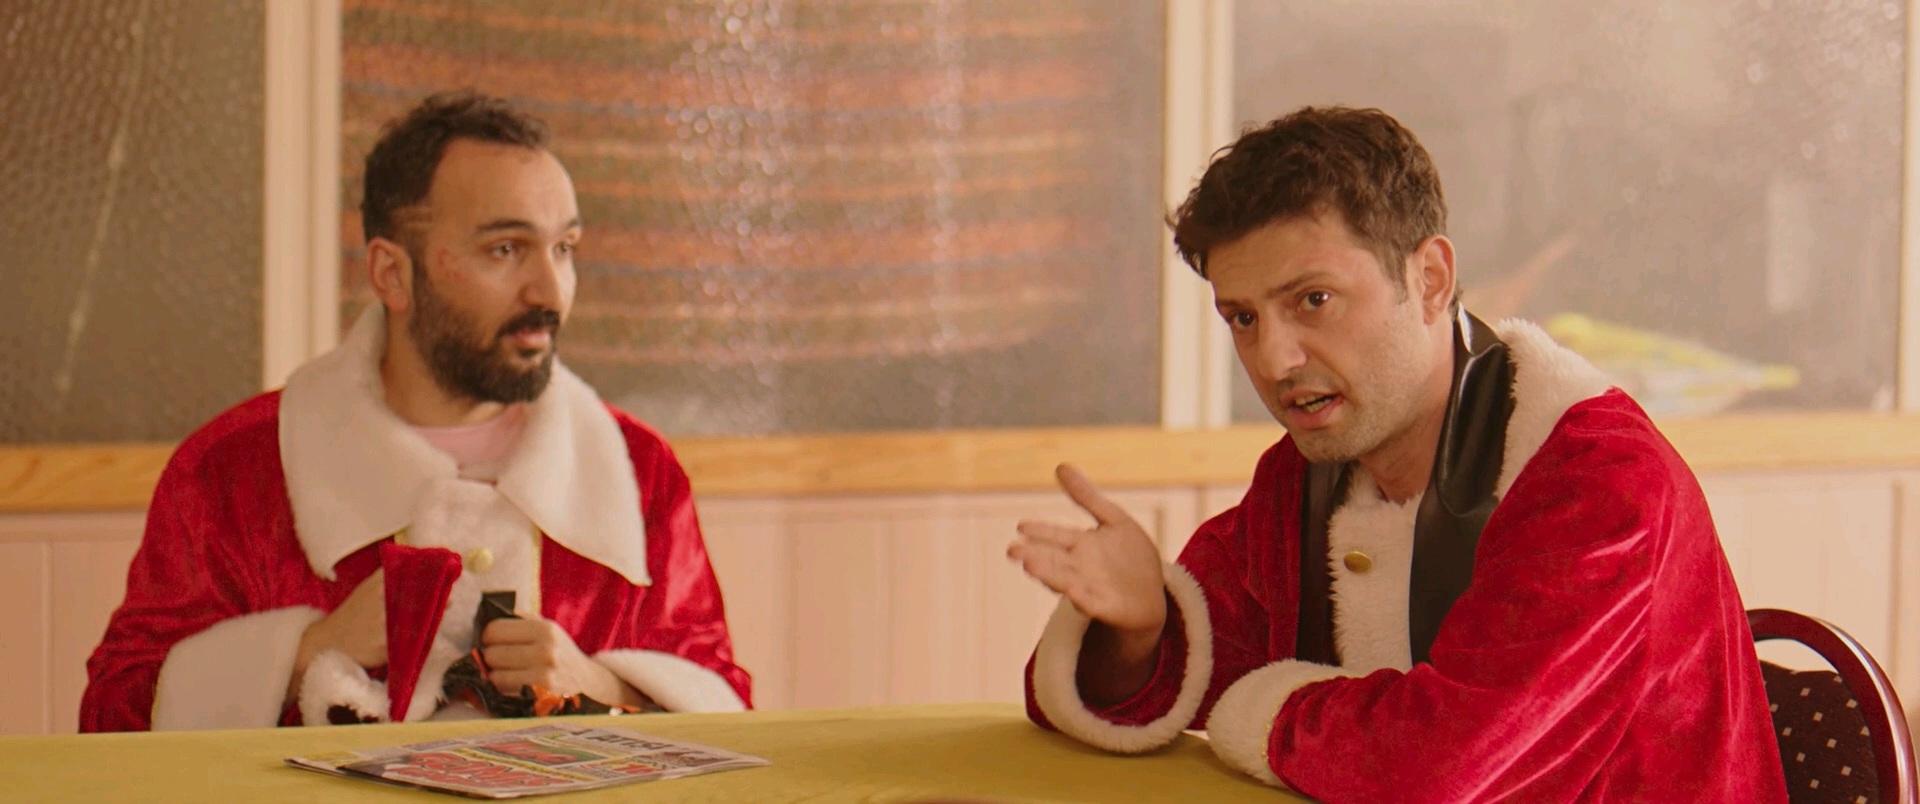 Hep Yek 3: Titrettin Beni | 2019 | Yerli Film | NF | WEB-DL | XviD | Sansürsüz | 1080p - m720p - m1080p | WEB-DL | Tek Link